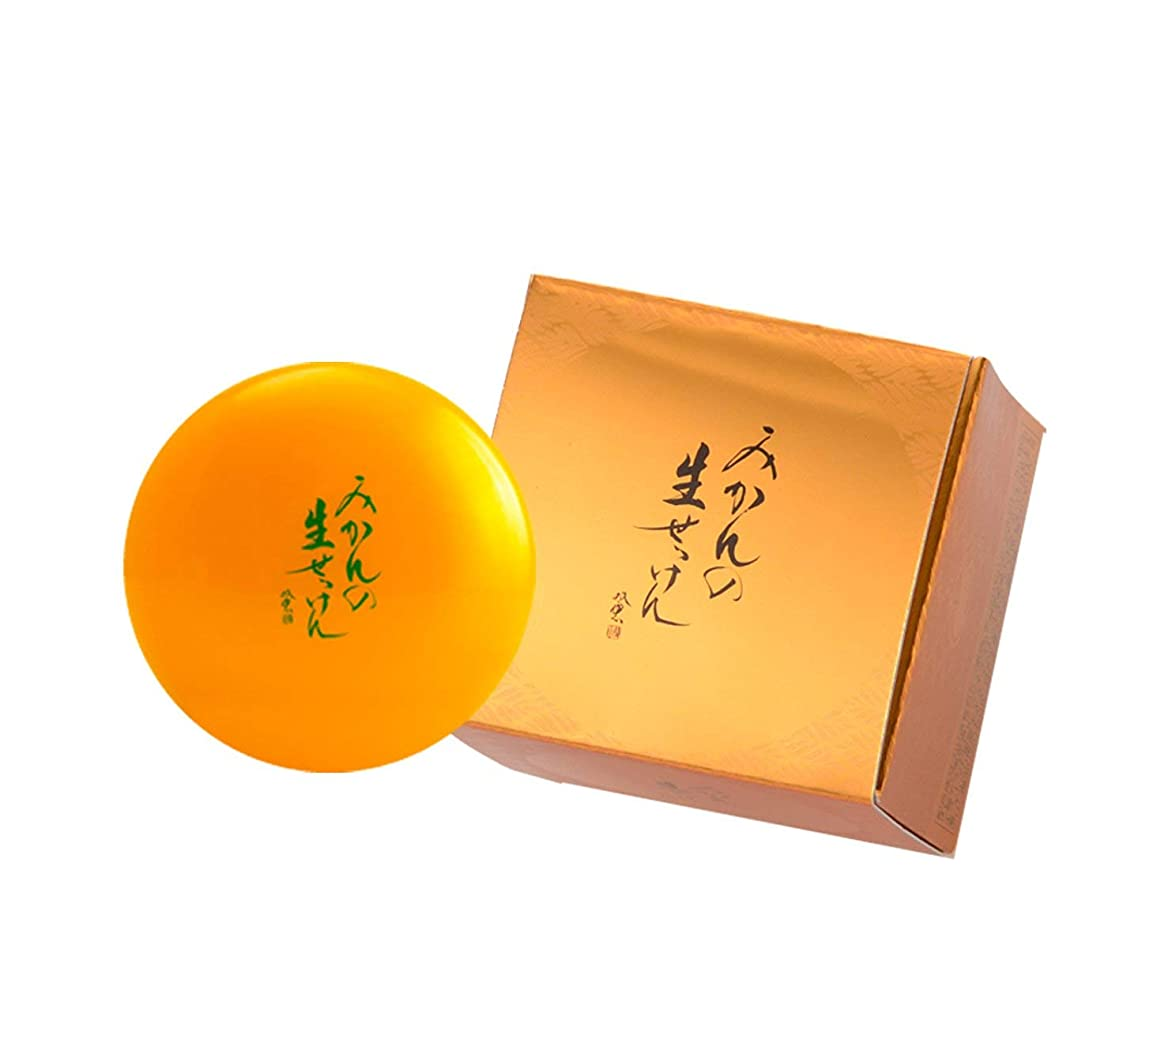 UYEKI美香柑みかんの生せっけん120g×24個セット